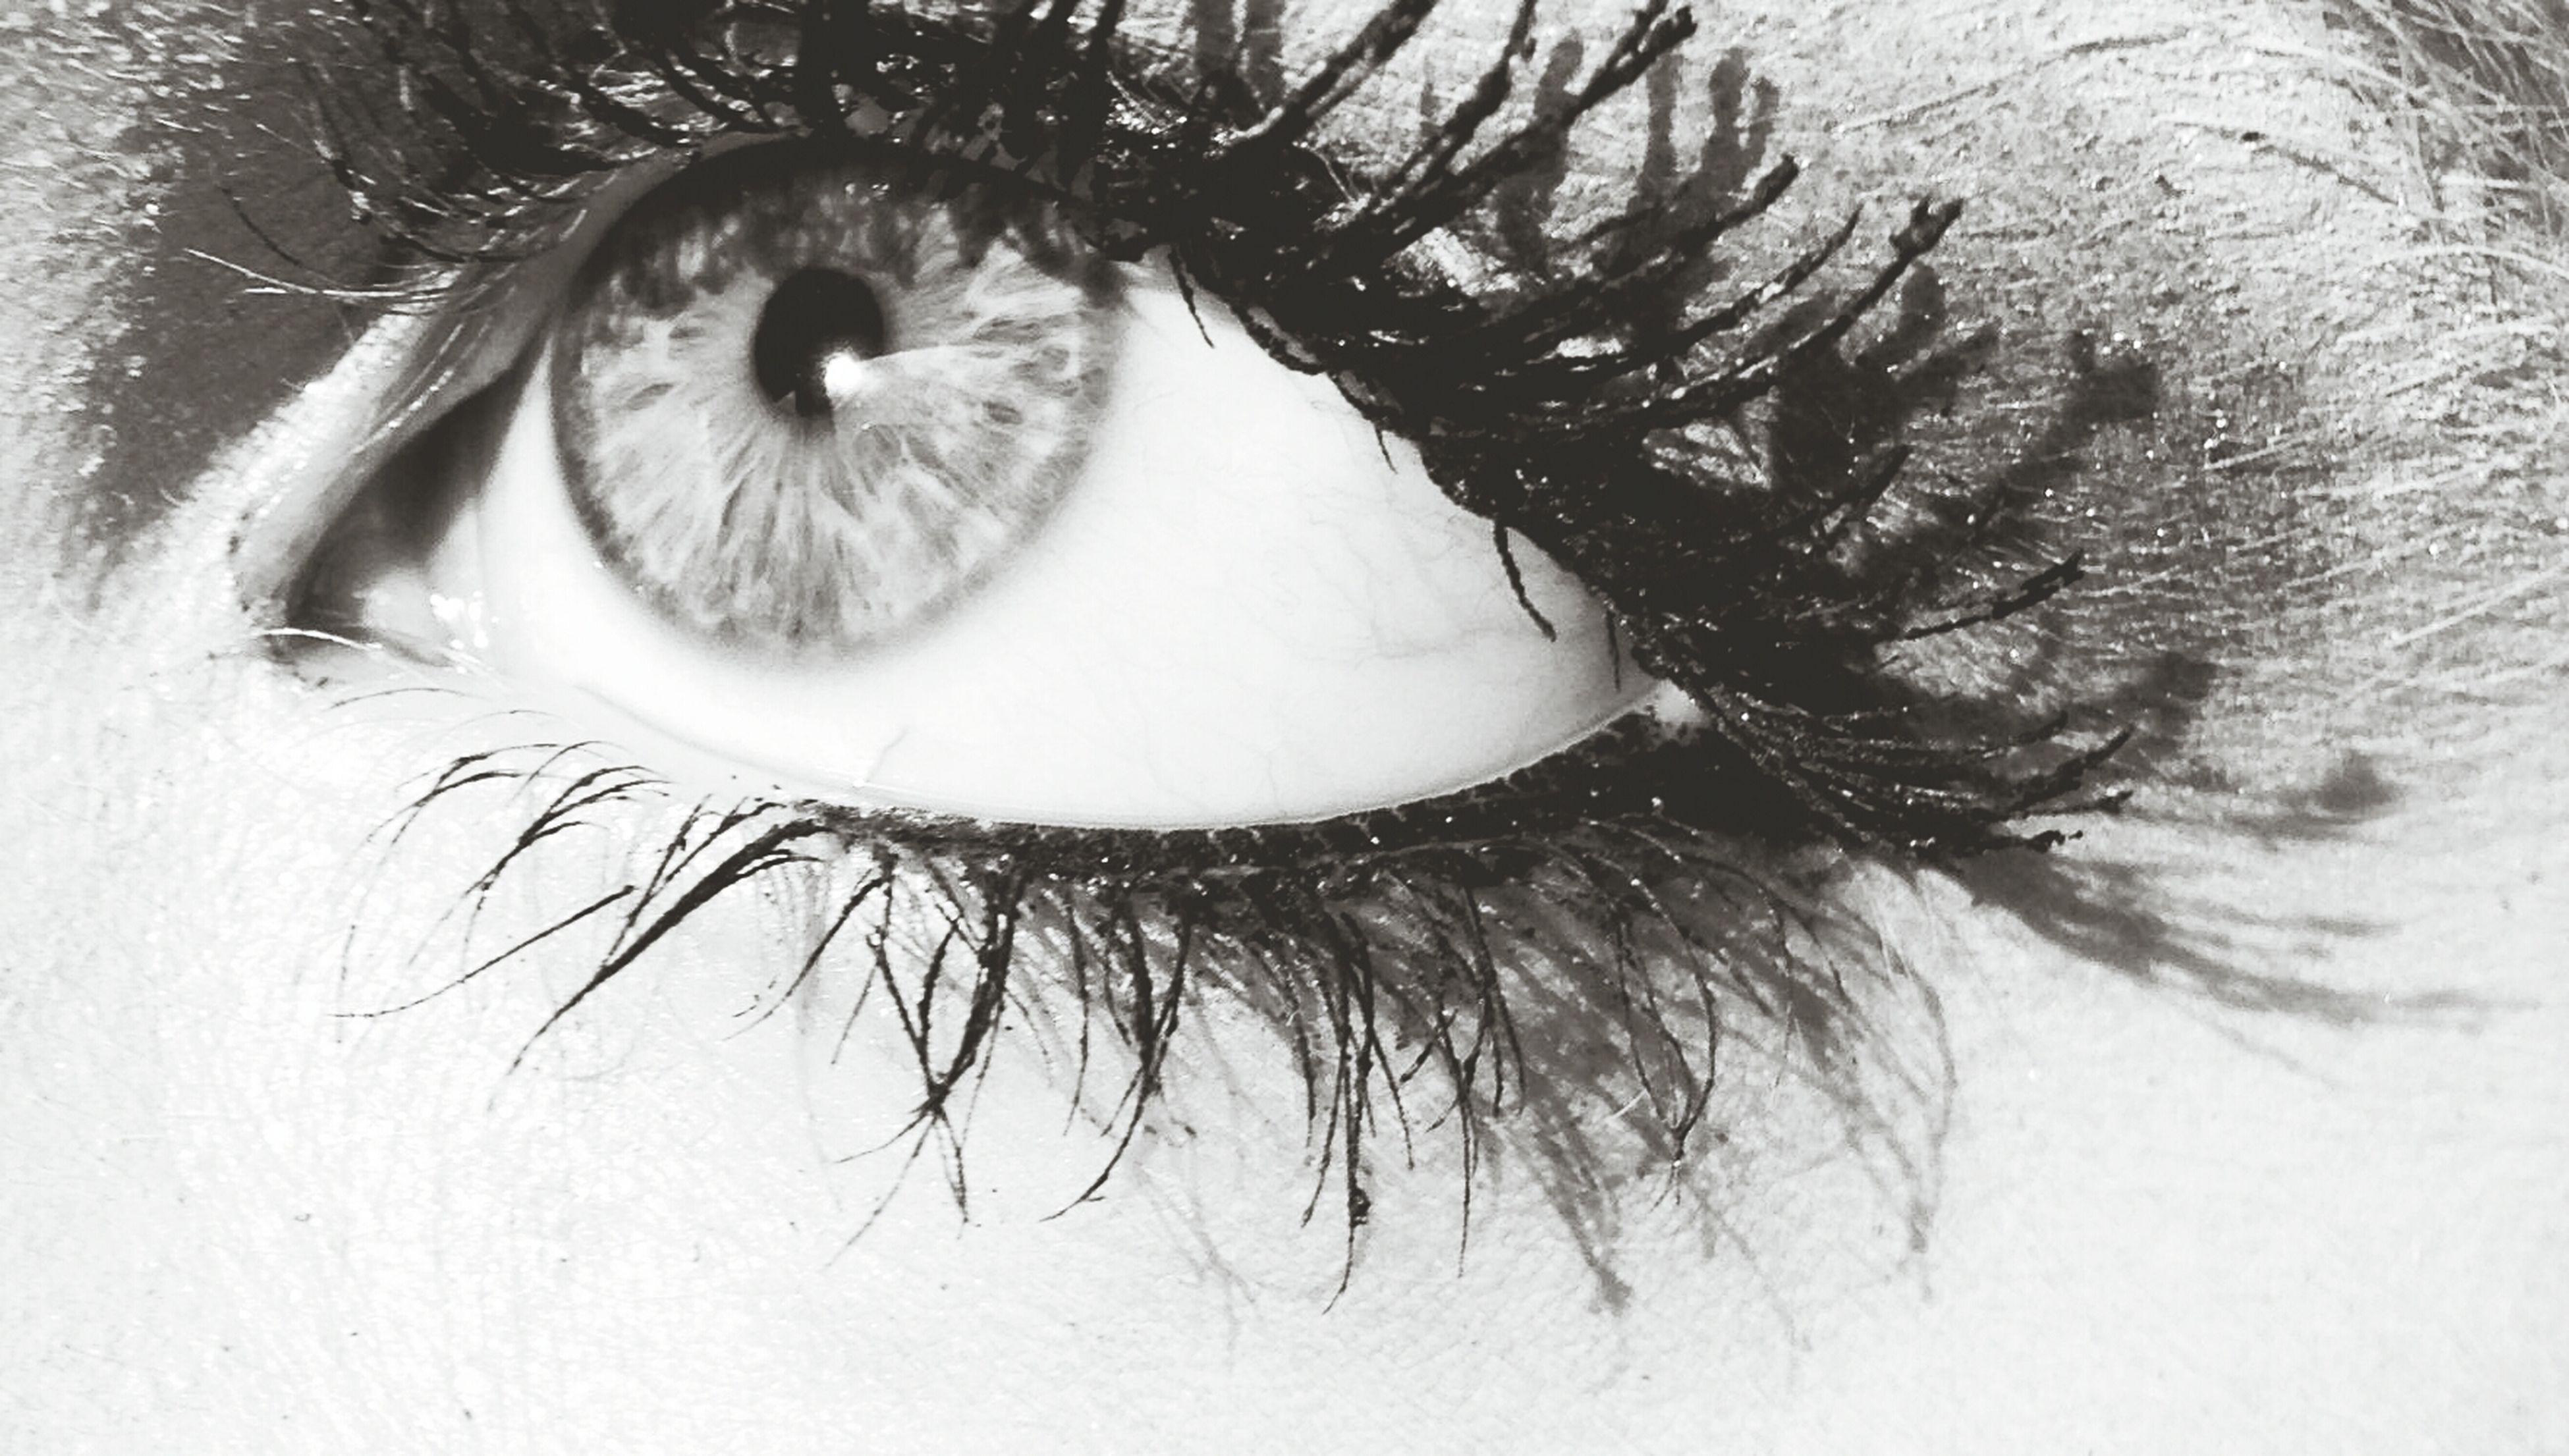 human eye, looking at camera, close-up, portrait, eyelash, sensory perception, eyesight, part of, human face, eyeball, extreme close-up, iris - eye, front view, indoors, headshot, lifestyles, human skin